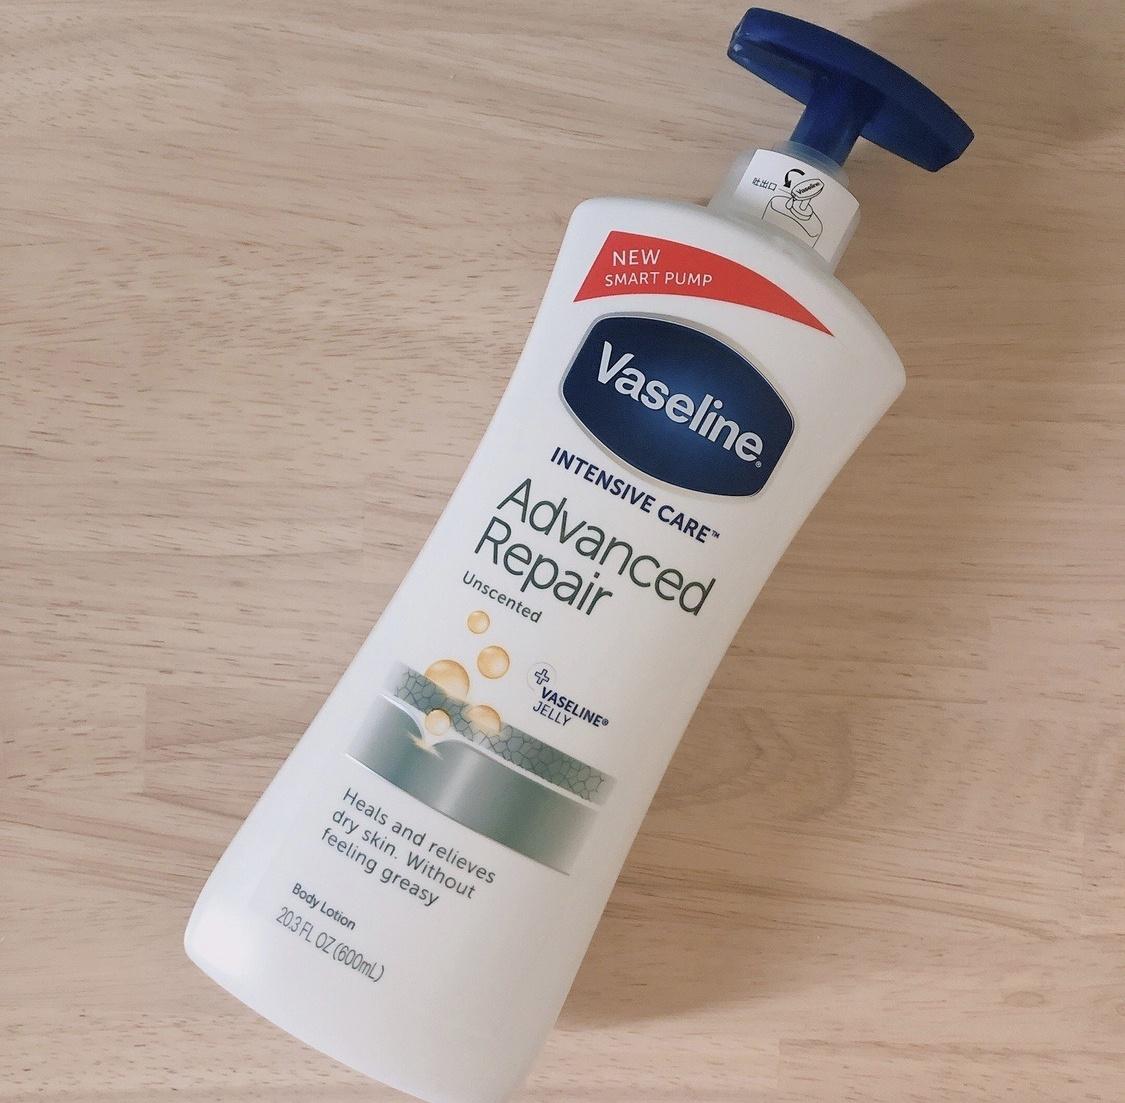 Vaseline(ヴァセリン)アドバンスドリペア ボディローションを使ったみーさん¨̮⸝⋆さんのクチコミ画像1